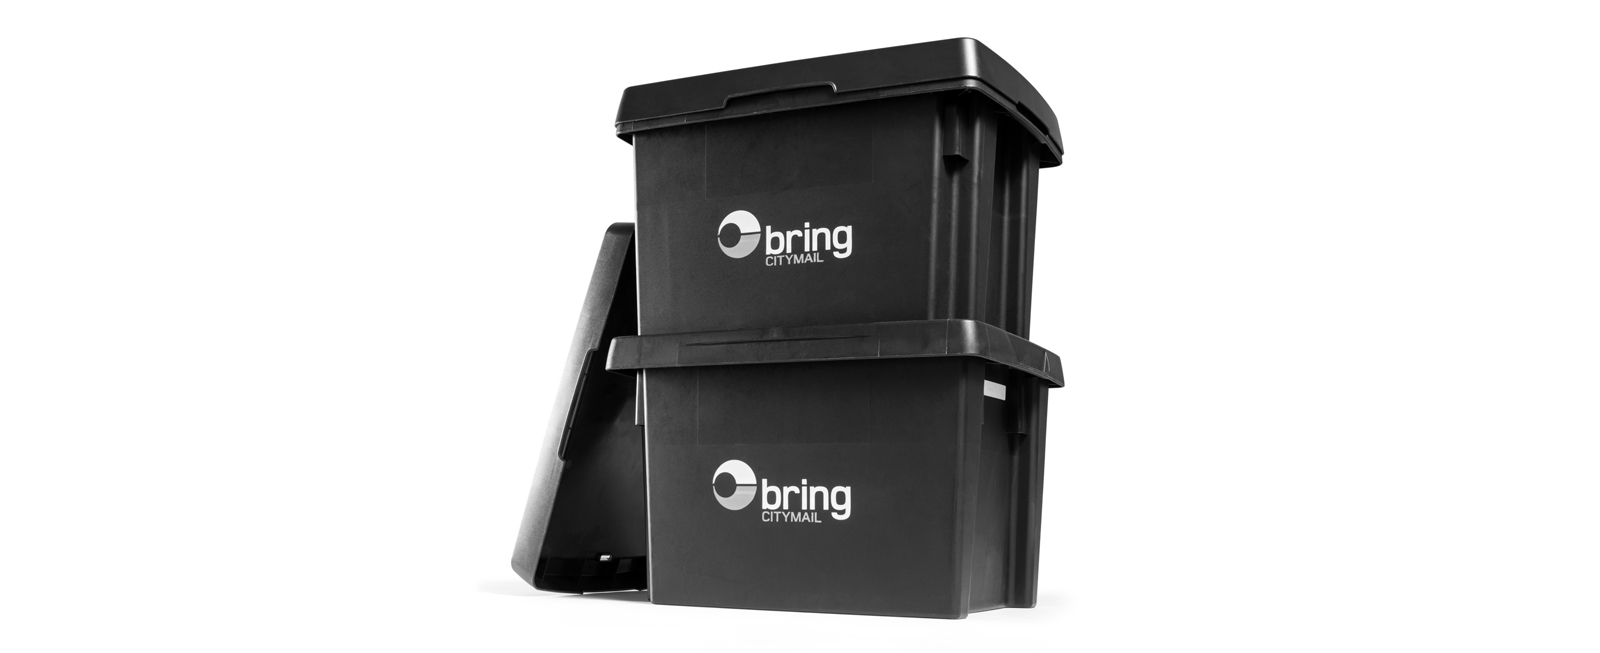 bringcitymail